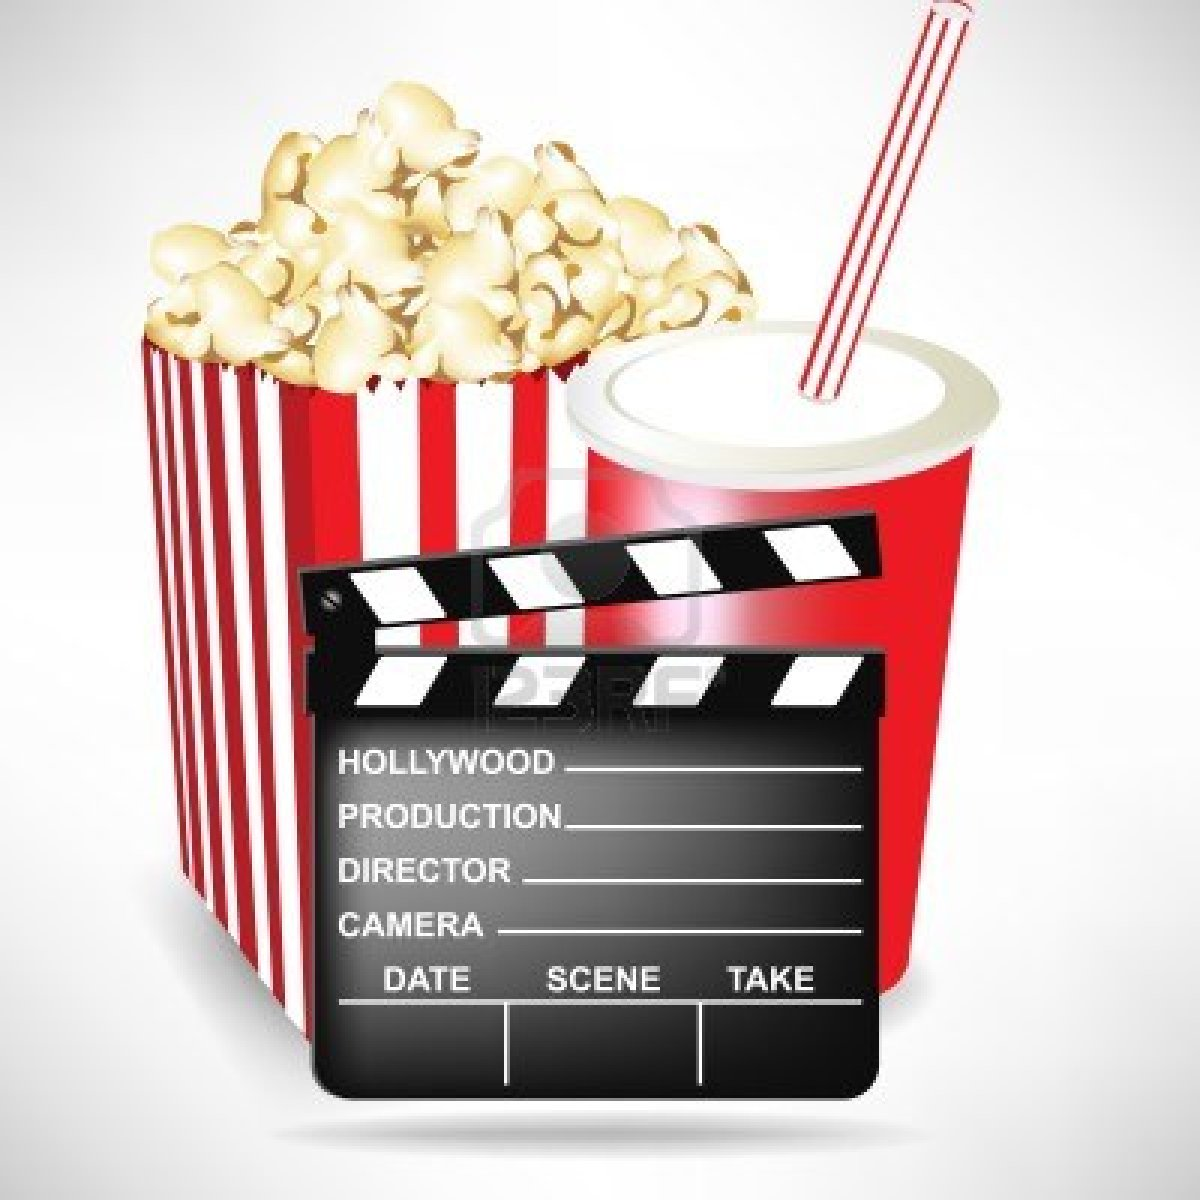 Popcorn clipart kid Of Popcorn Popcorn guides travel